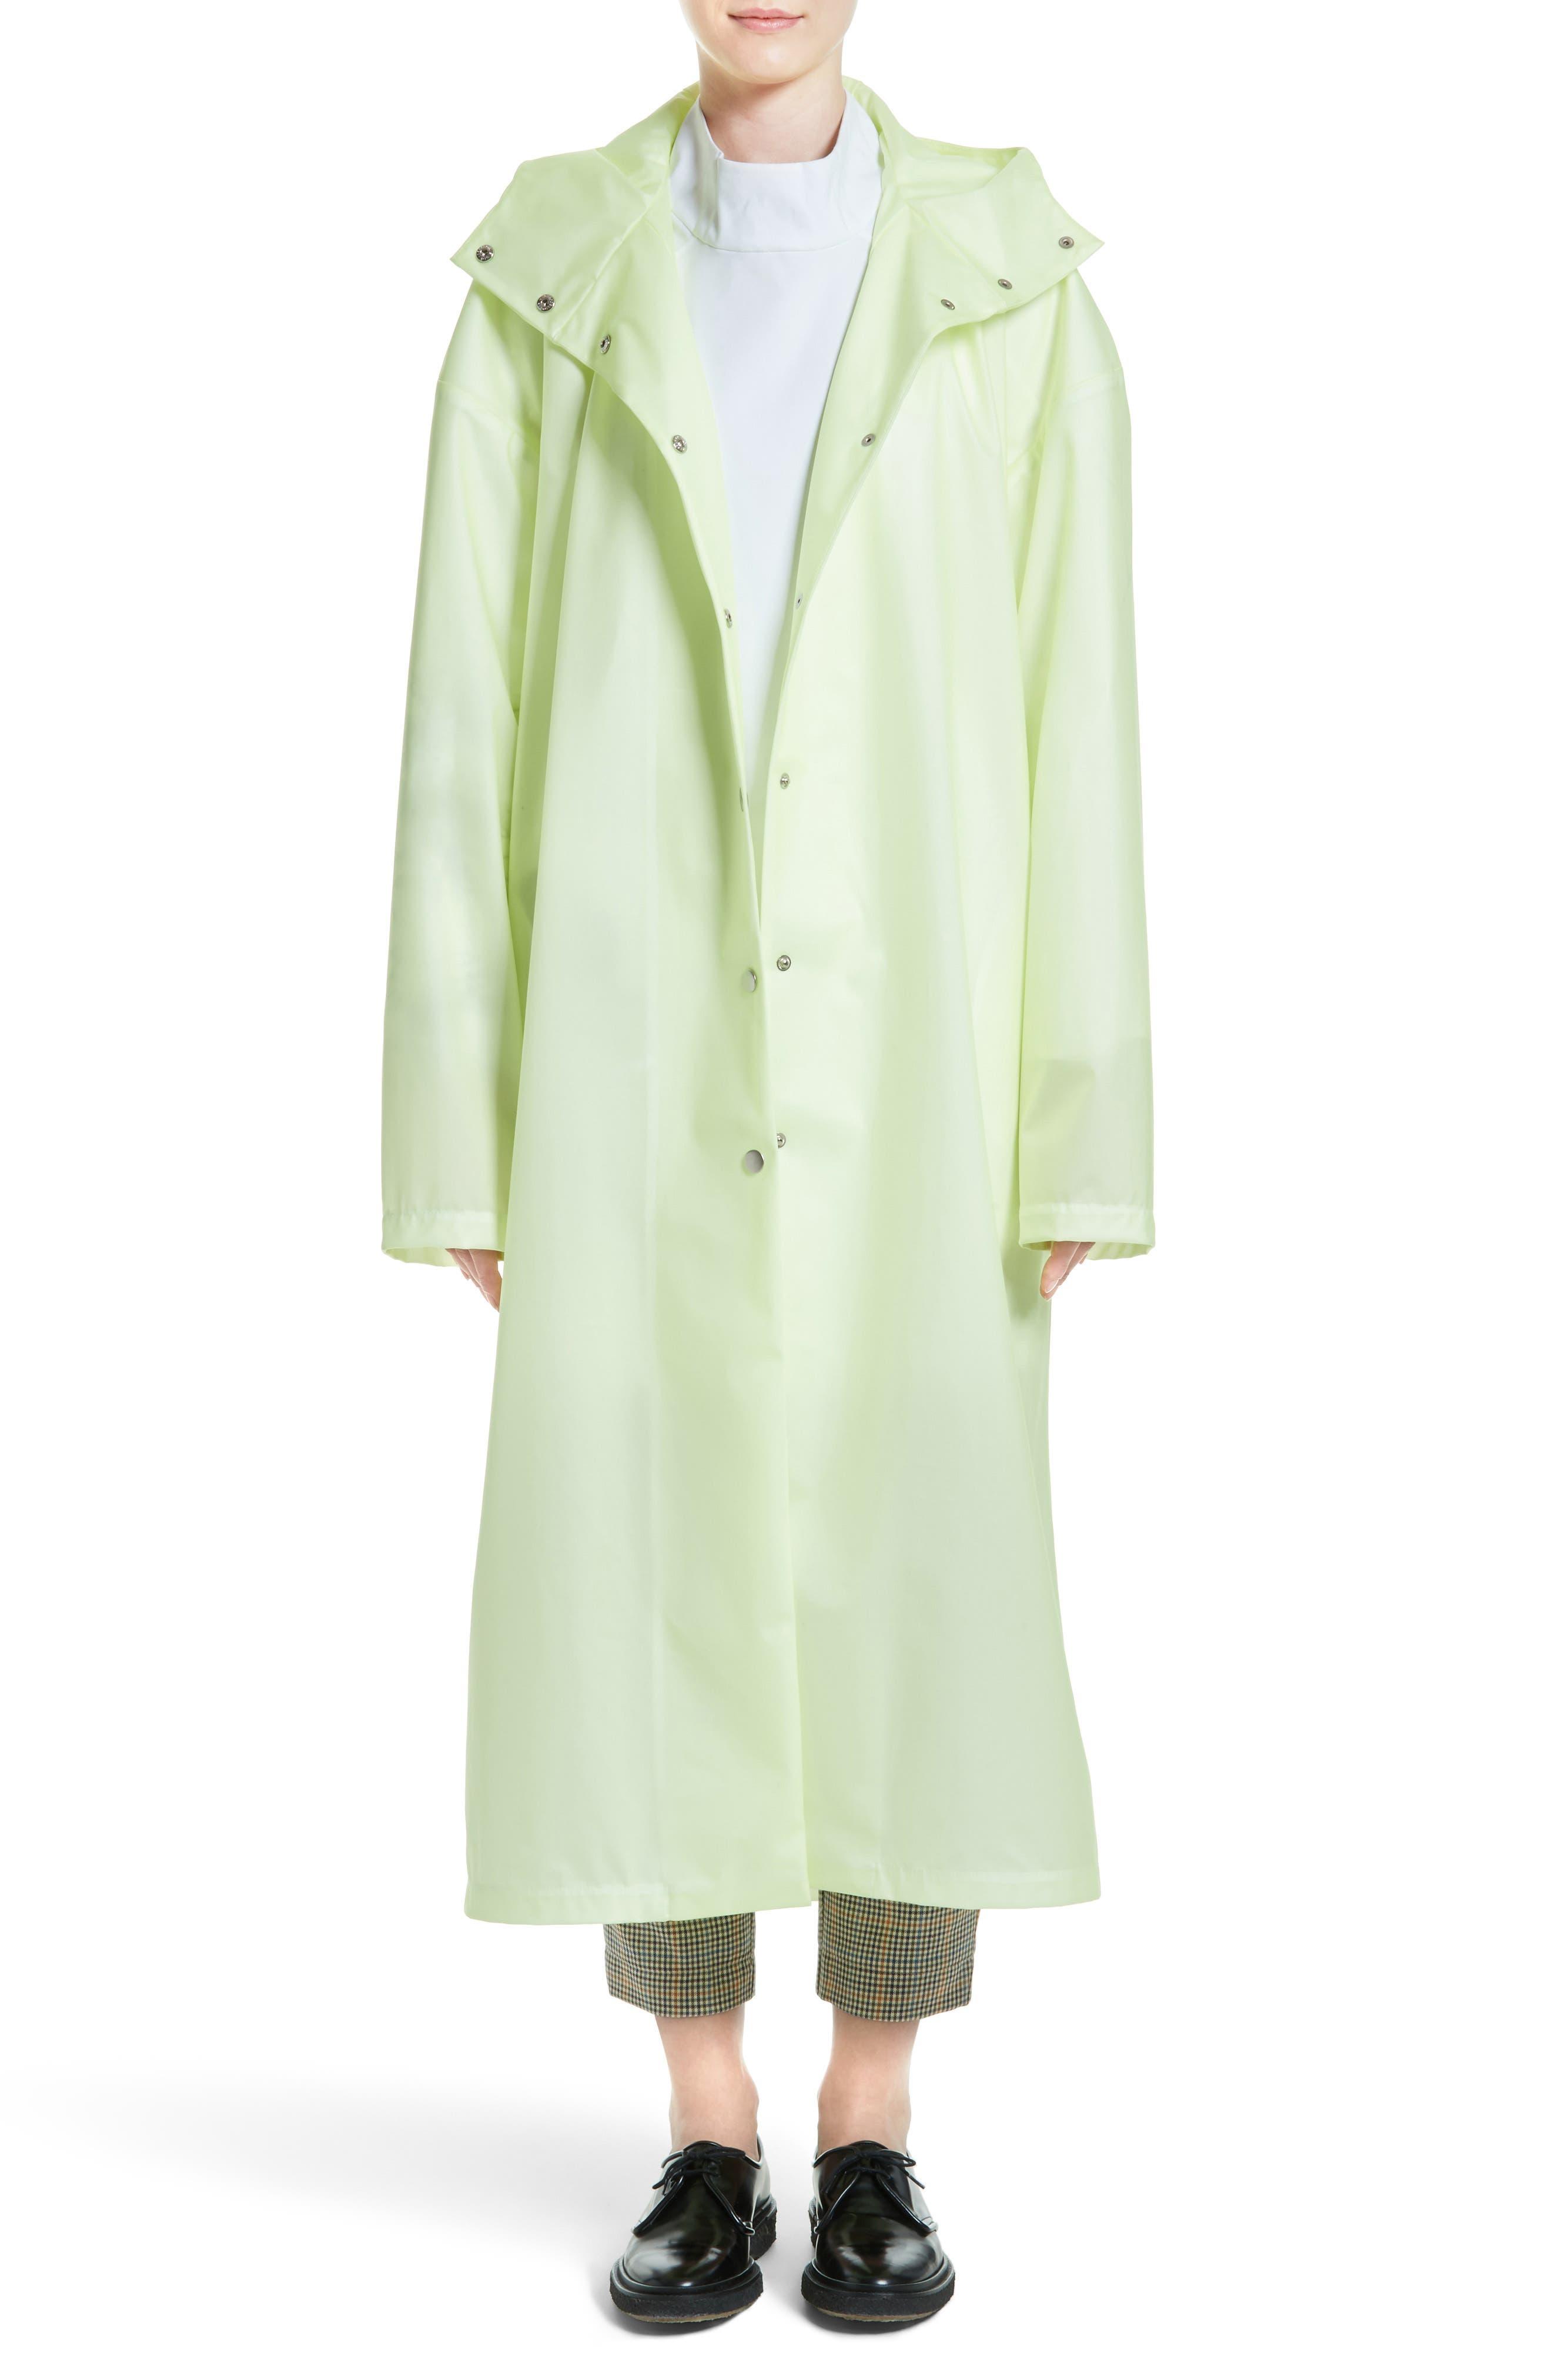 Main Image - A.W.A.K.E. Oversize Waterproof Hooded Coat